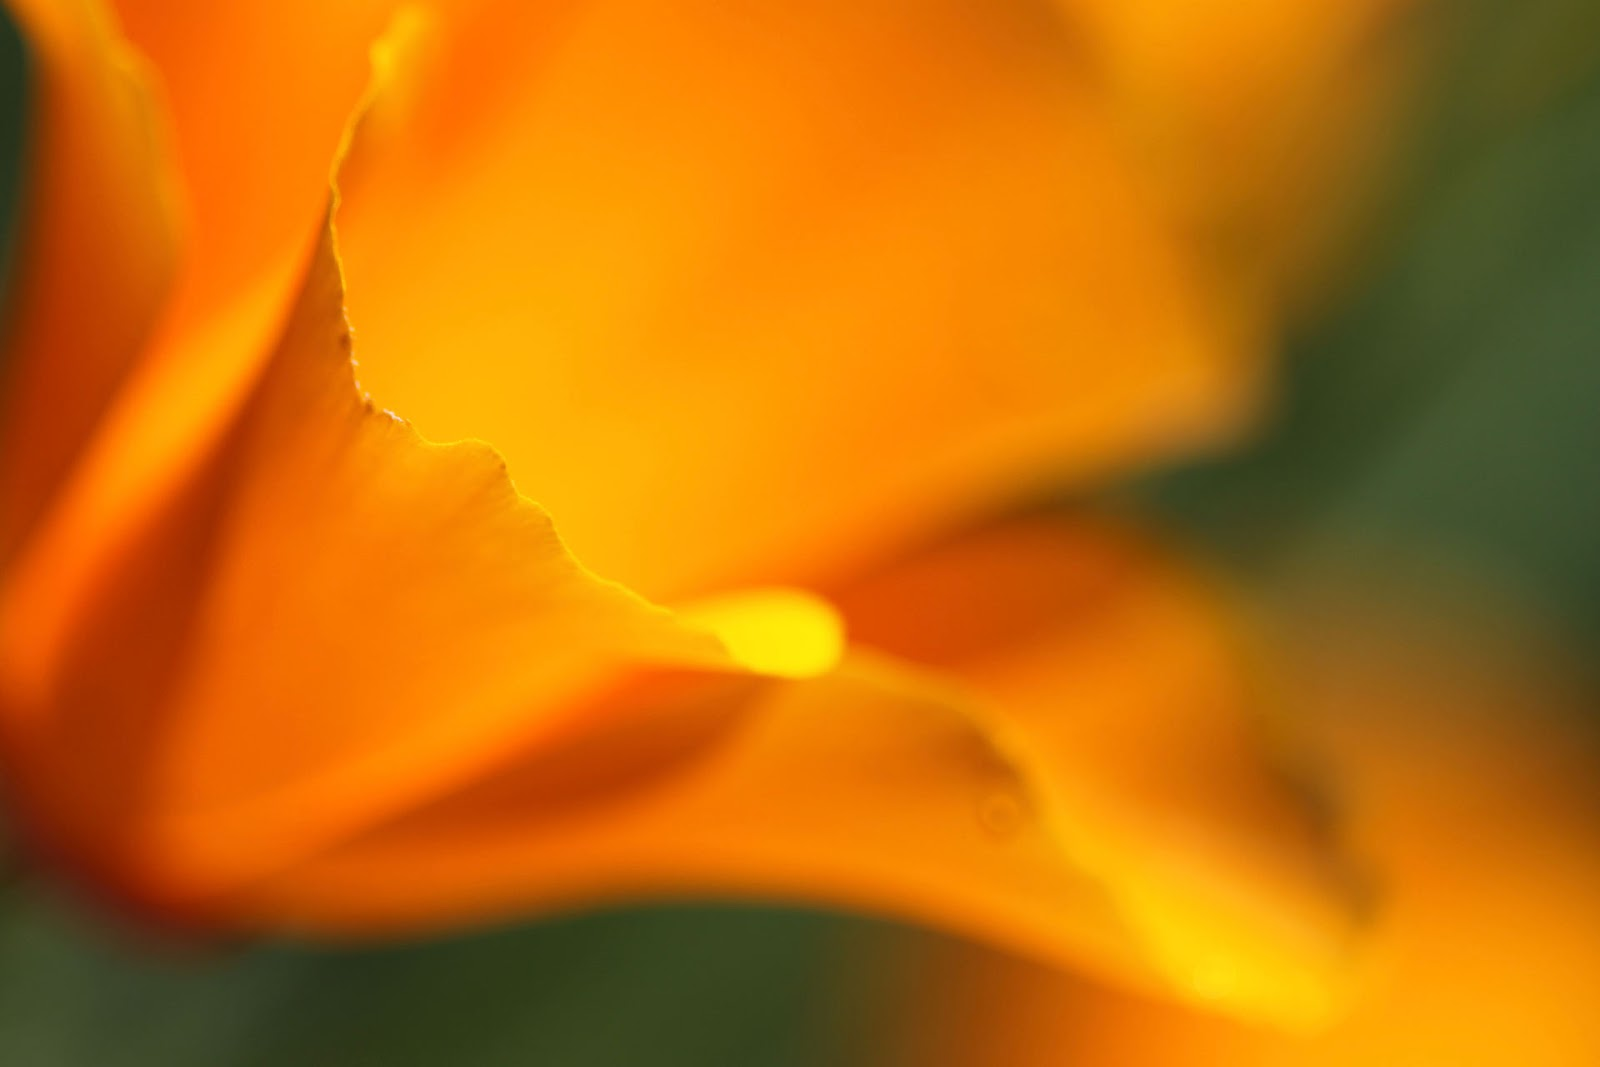 http://1.bp.blogspot.com/-894pCUQFLXE/T4AGCbdGmZI/AAAAAAAADnE/VVZwvZhVQvI/s1600/Golden_Bloom_by_Twinmama.jpg